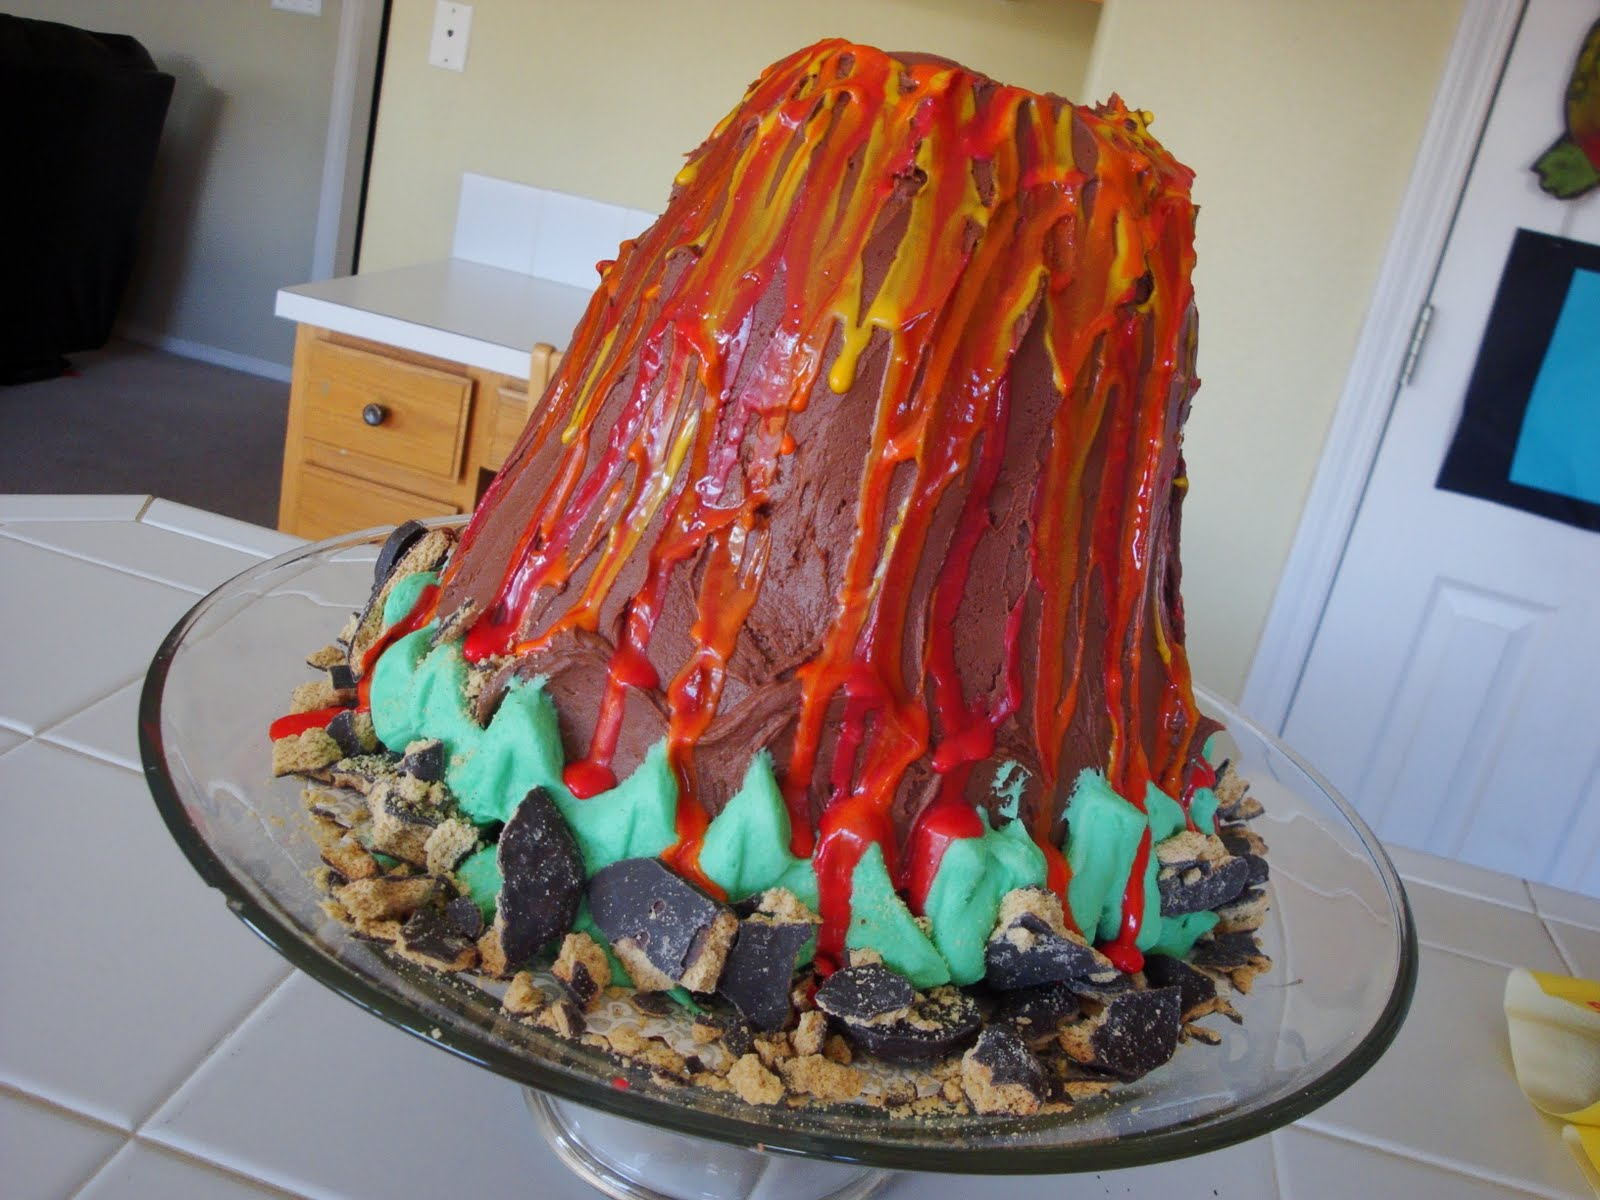 How Can I Make A Volcano Cake Erupt